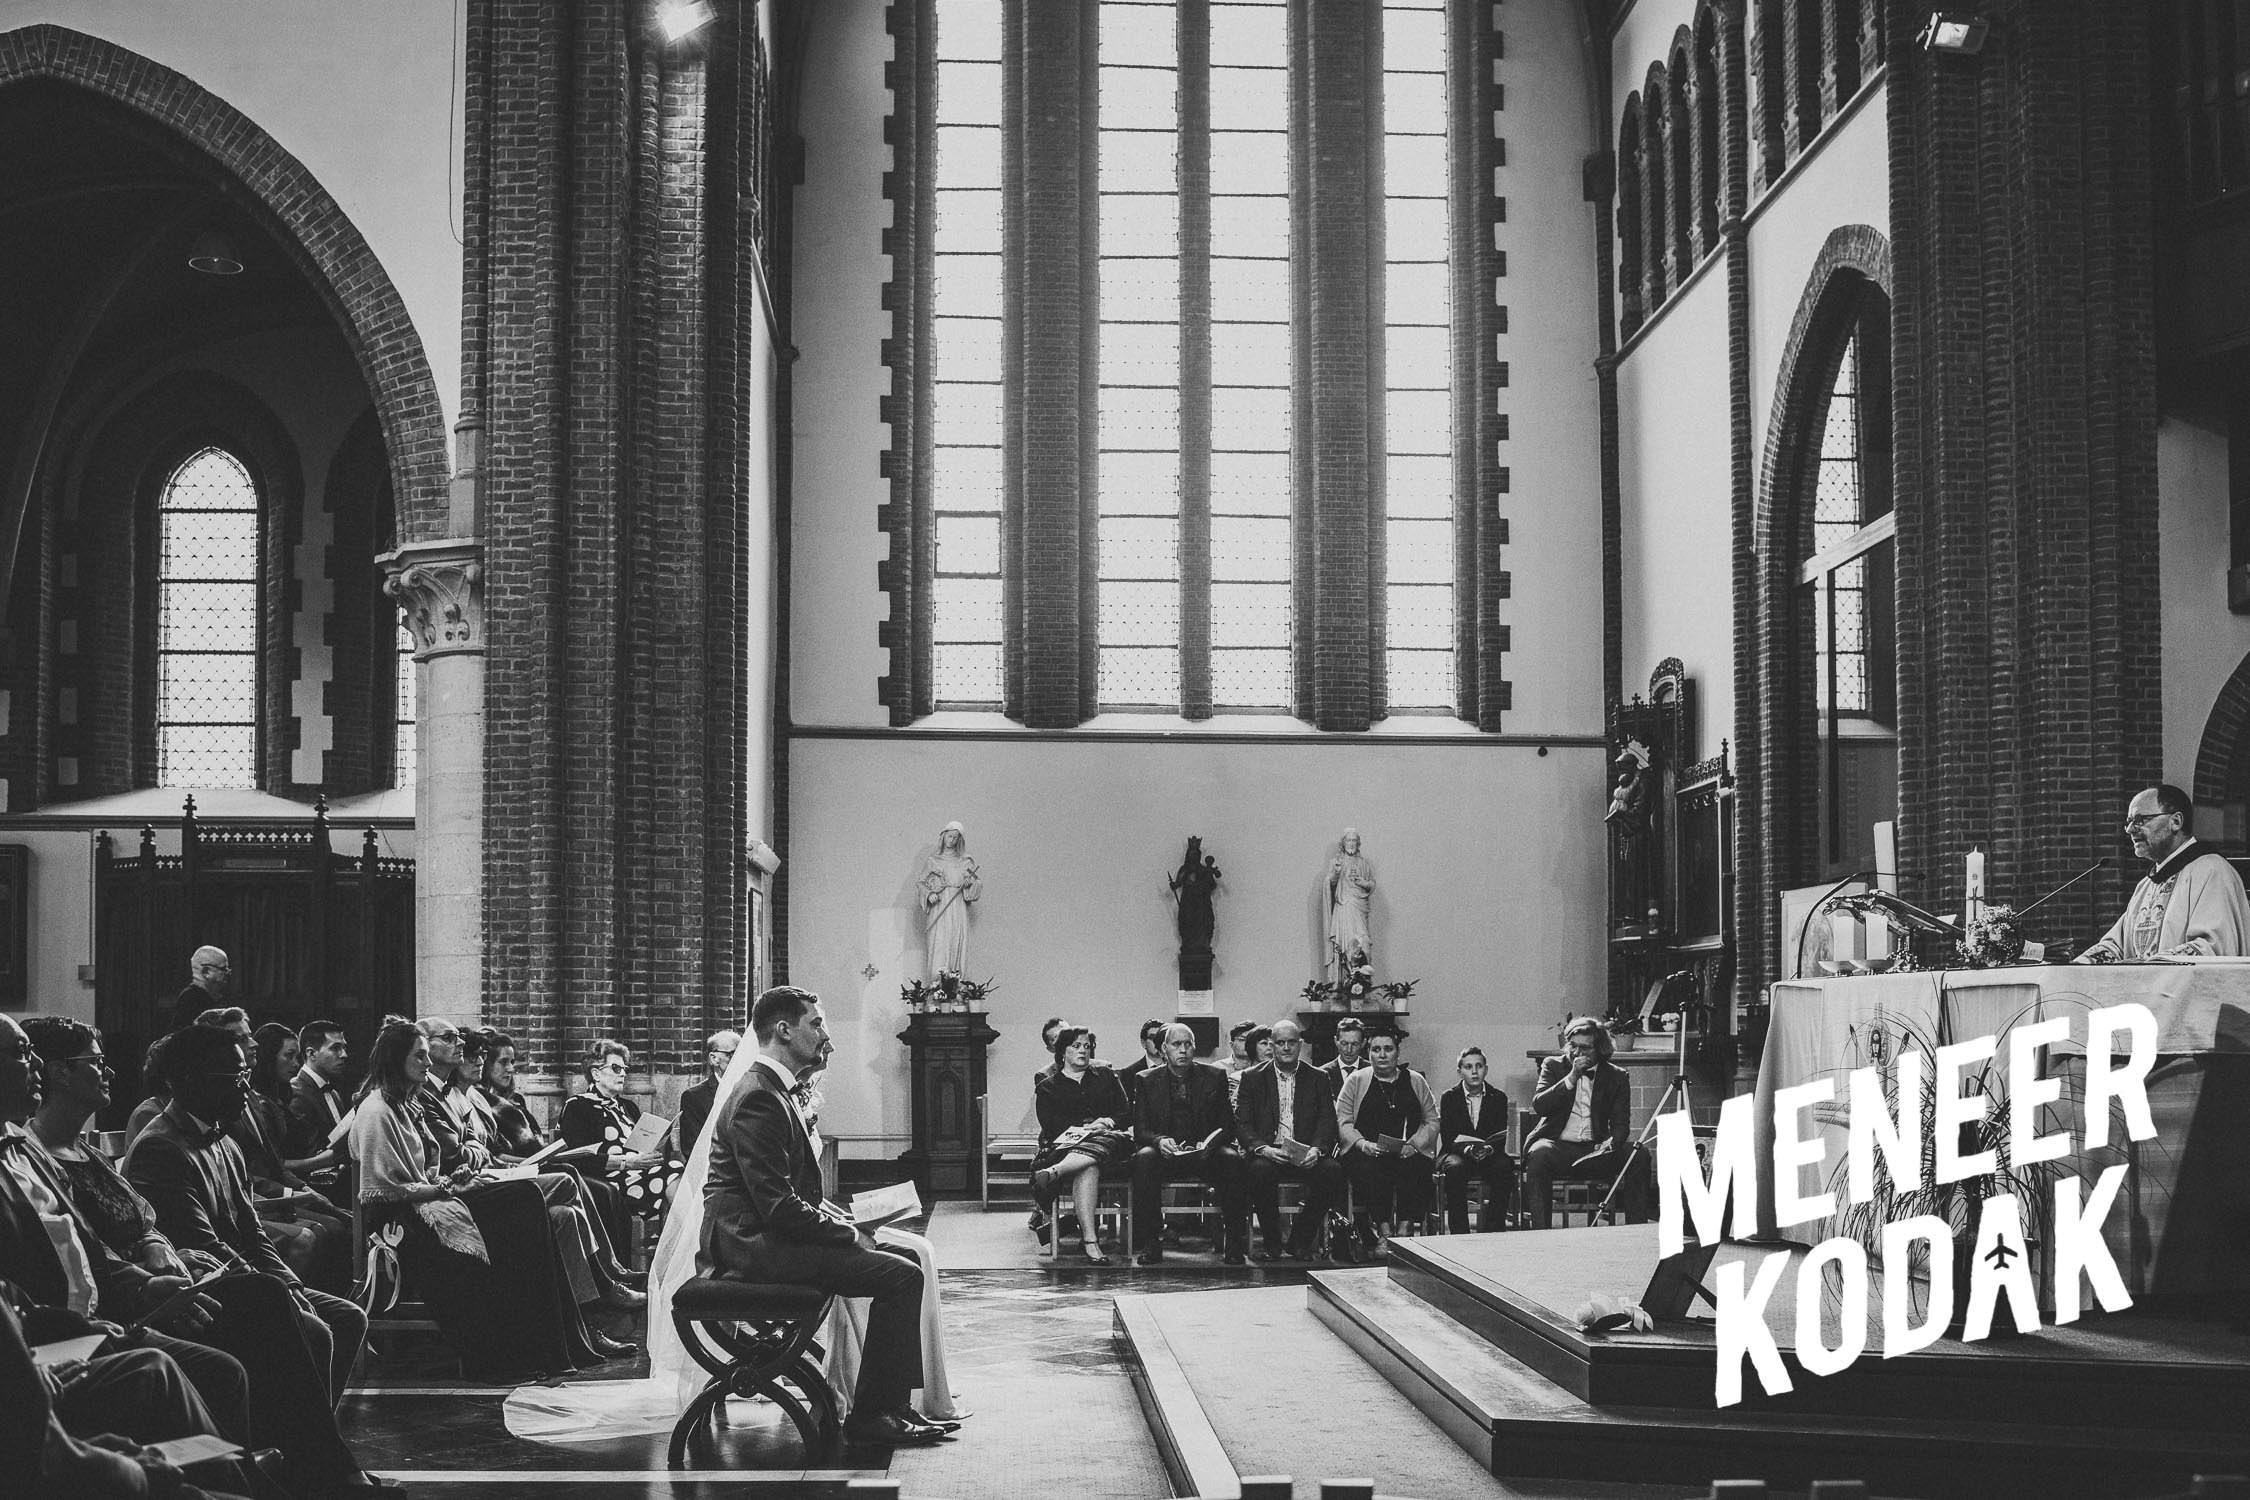 Meneer Kodak - Bruidsfotograaf - Aalst - E&L-078.jpg